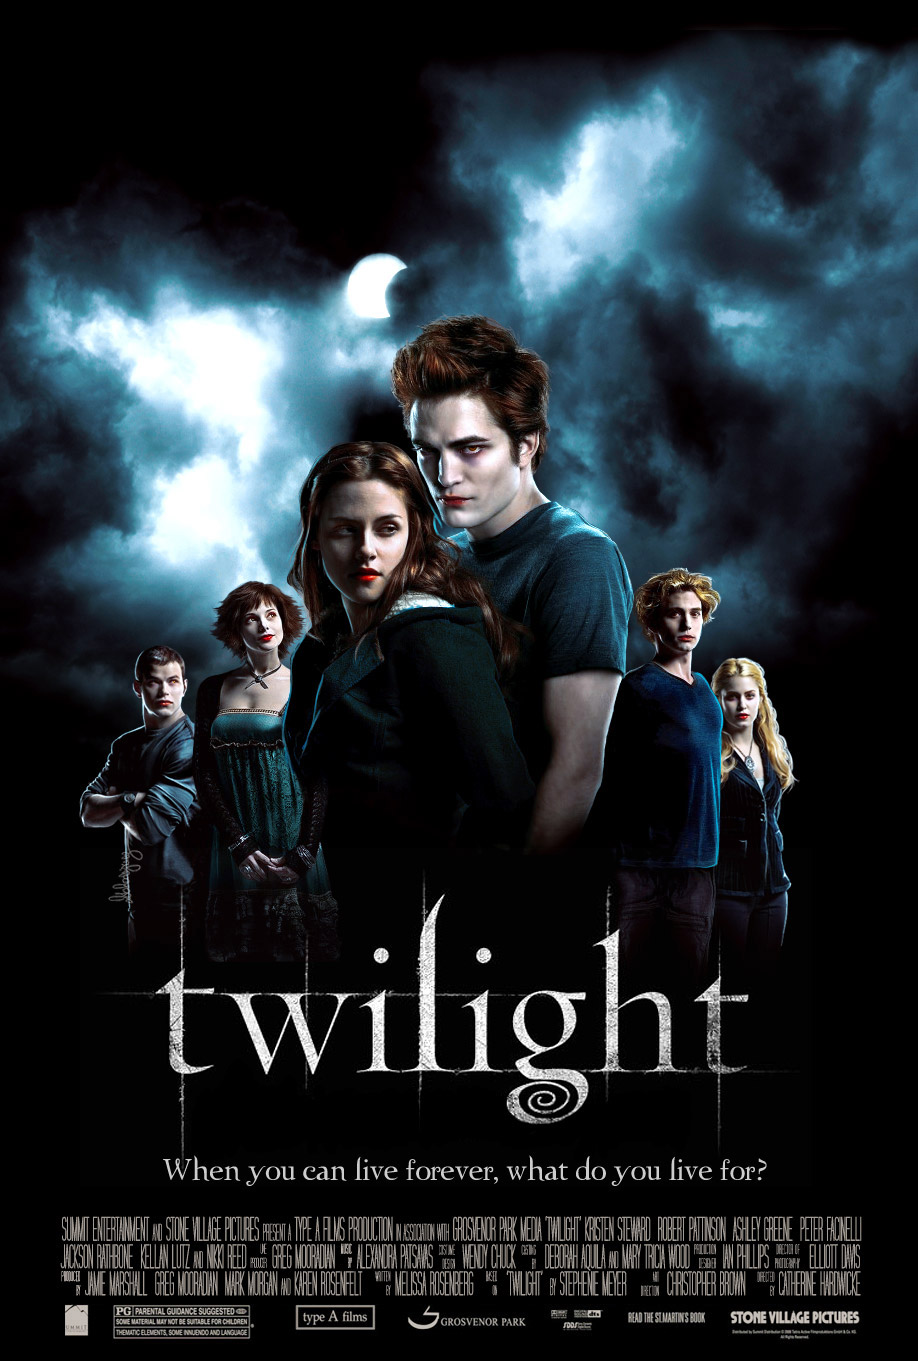 Twilight - Movies Maniac